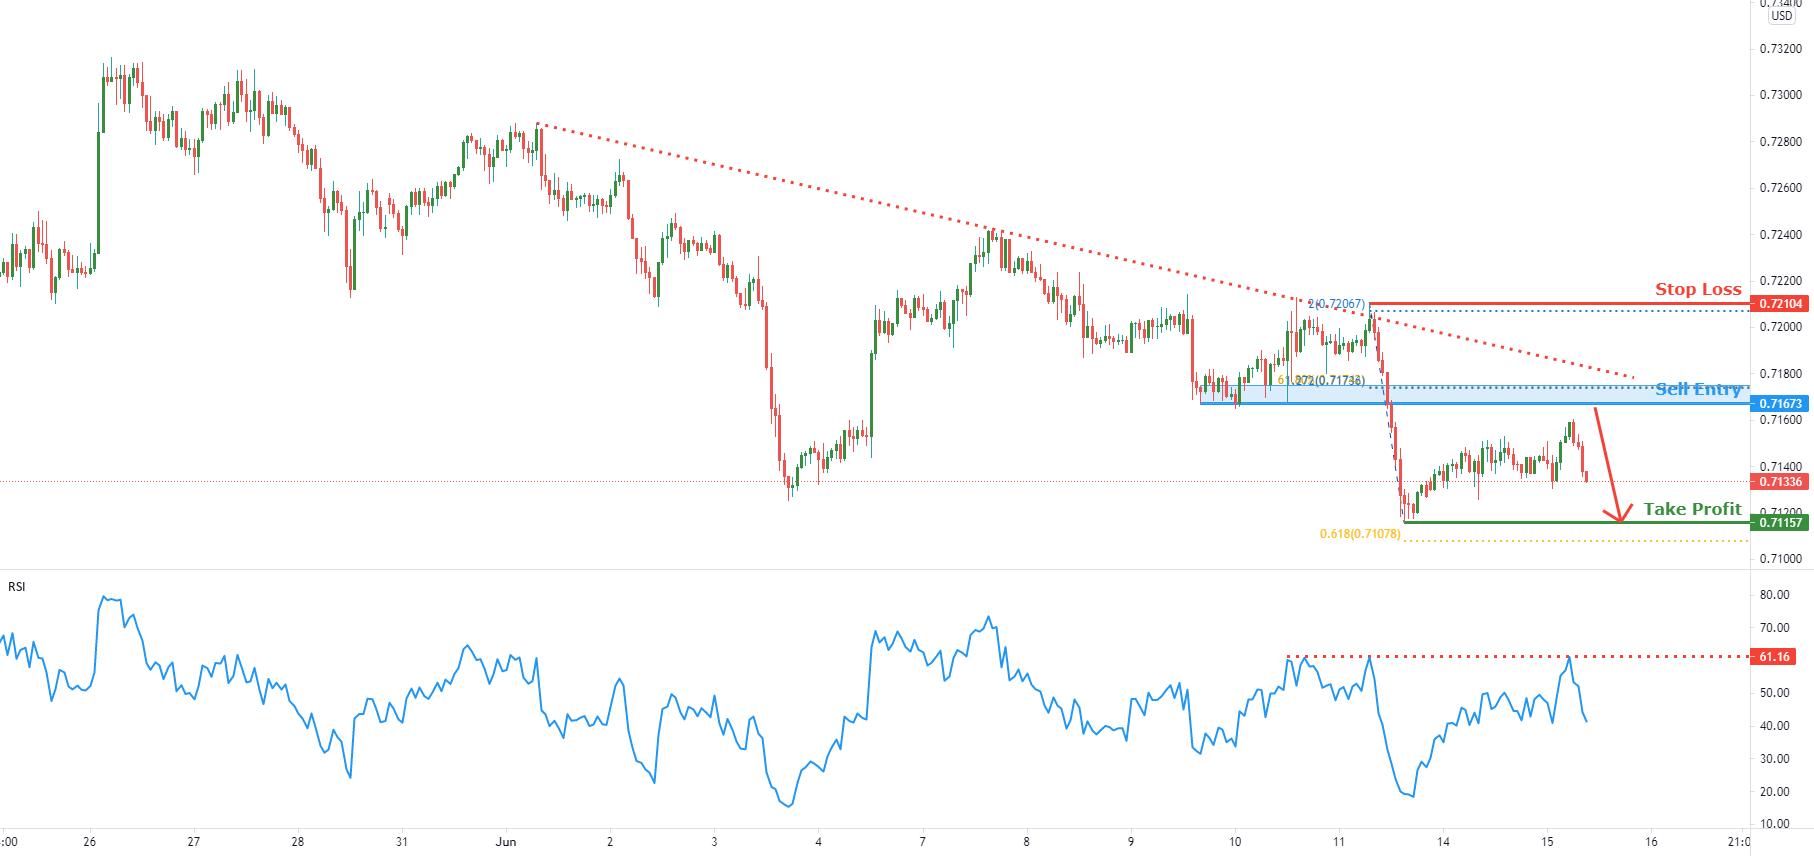 NZDUSD facing bearish pressure   15th June 2021 for FX:NZDUSD by FXCM